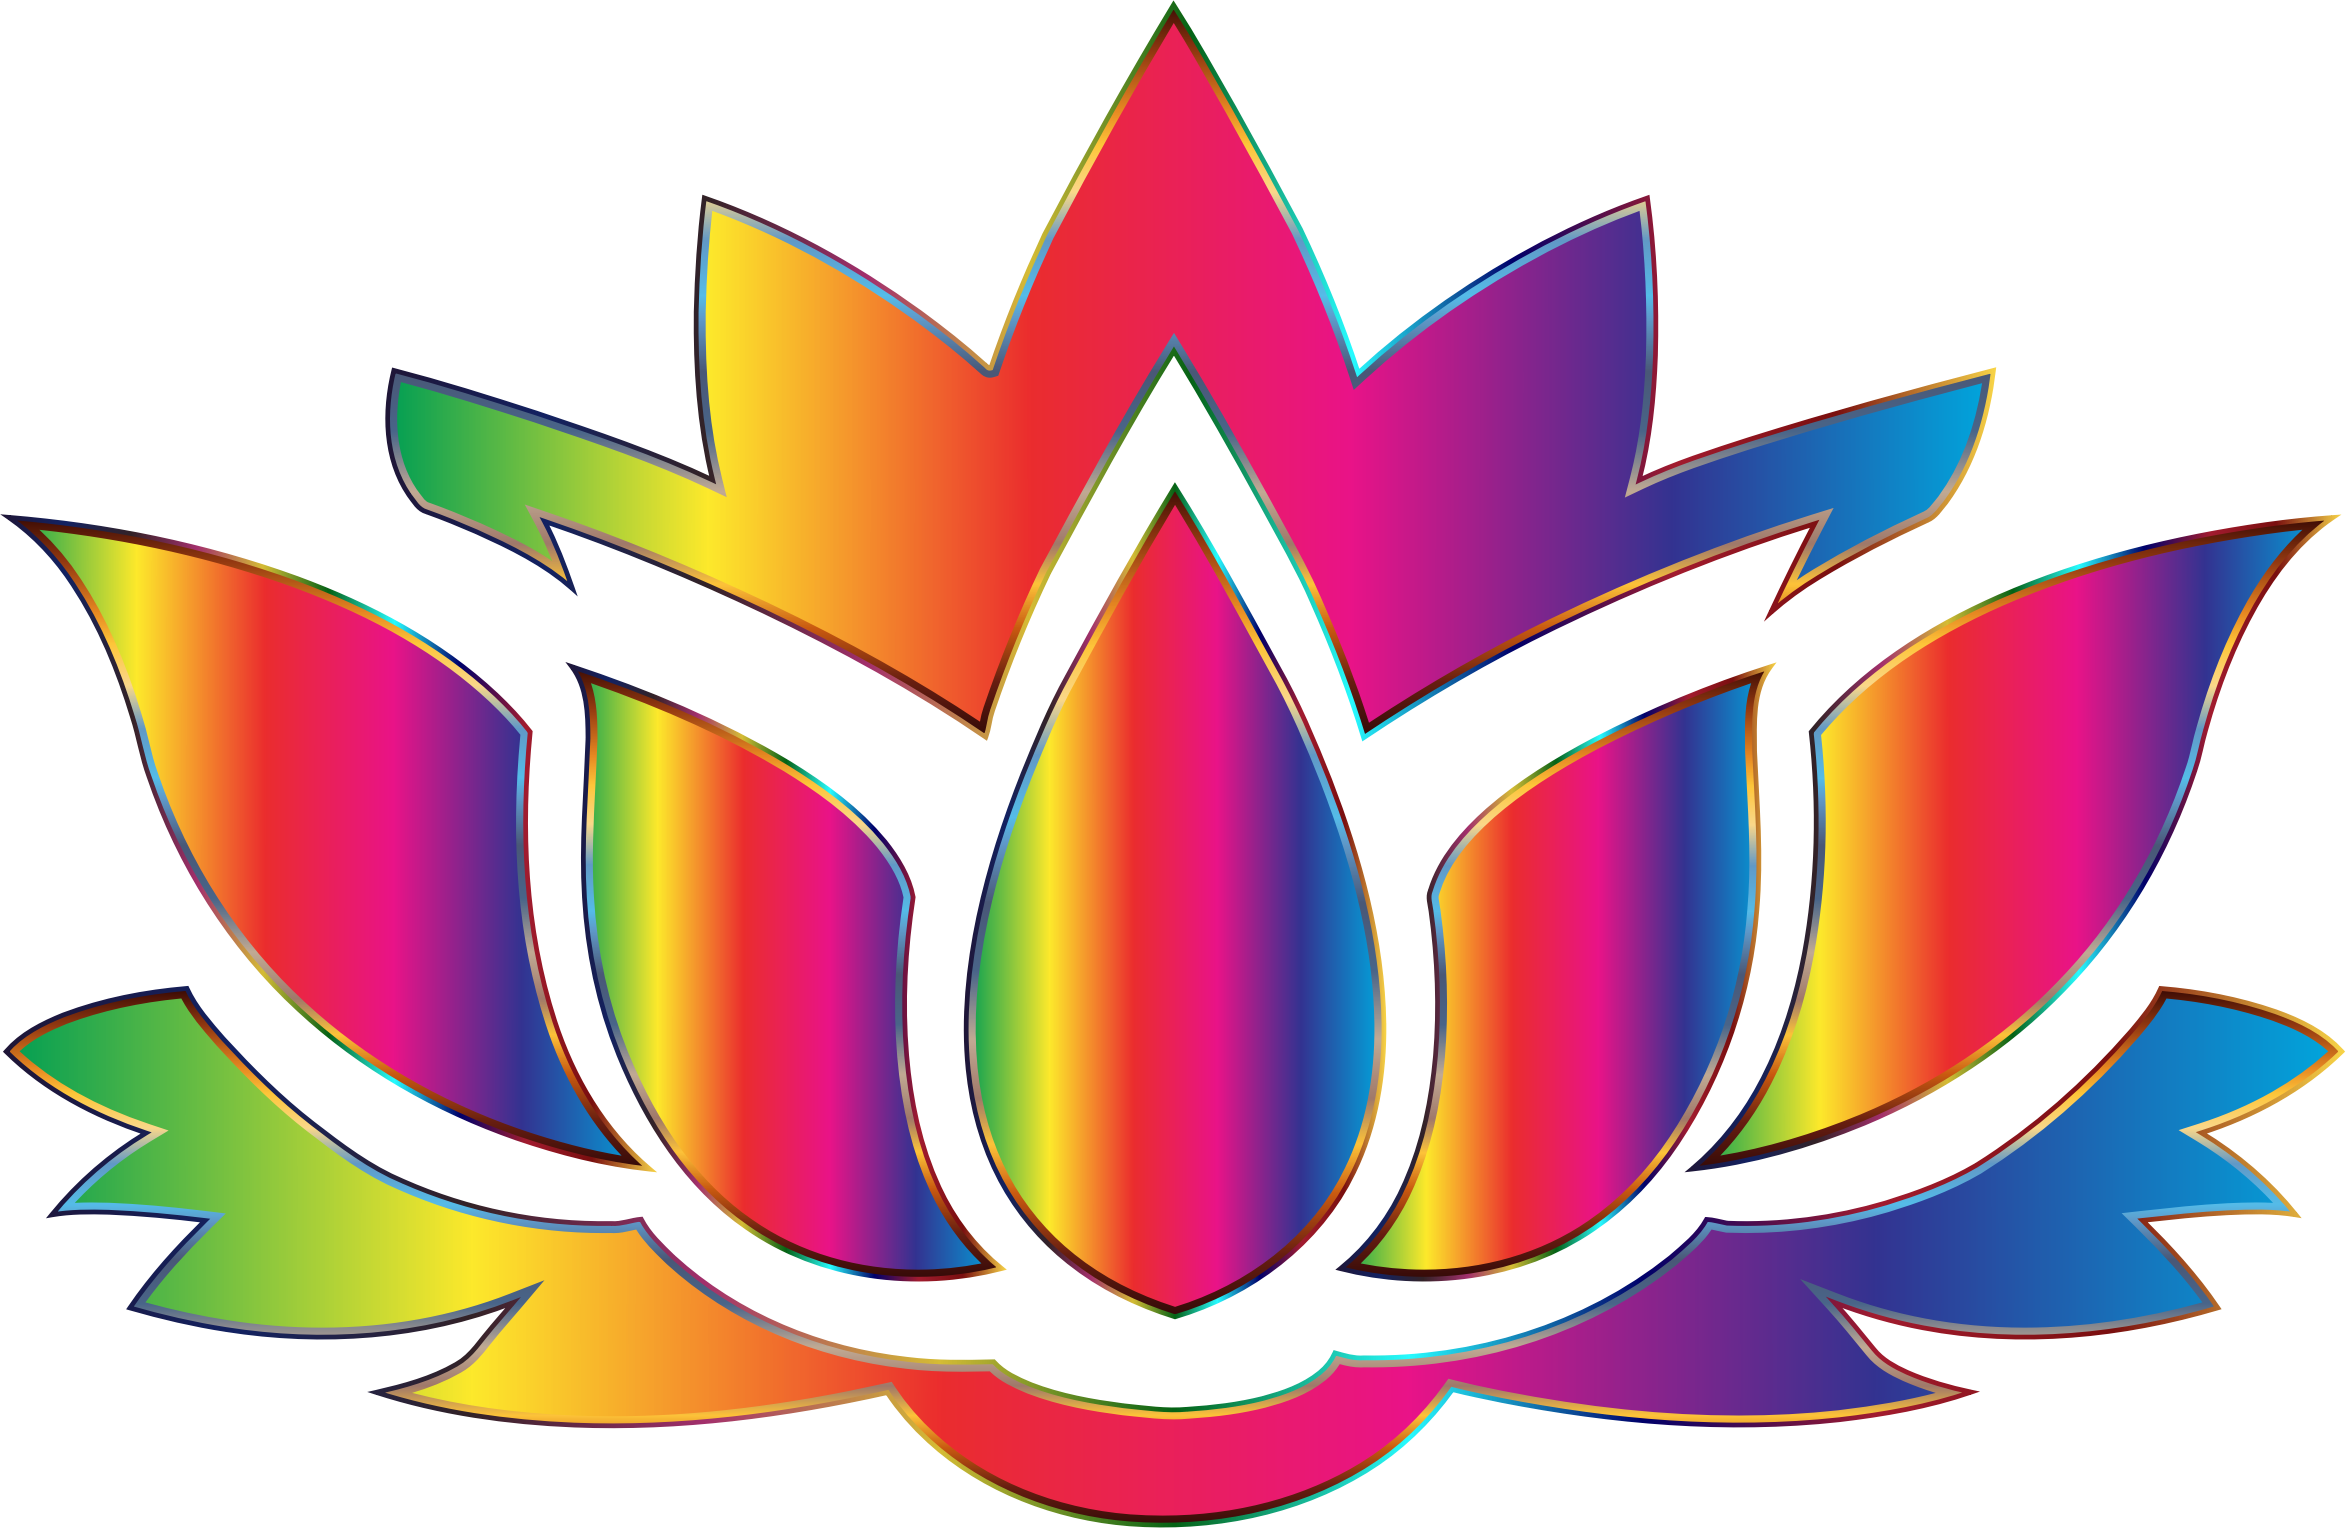 Lotus chakra free pnglogocoloring. Passover clipart round